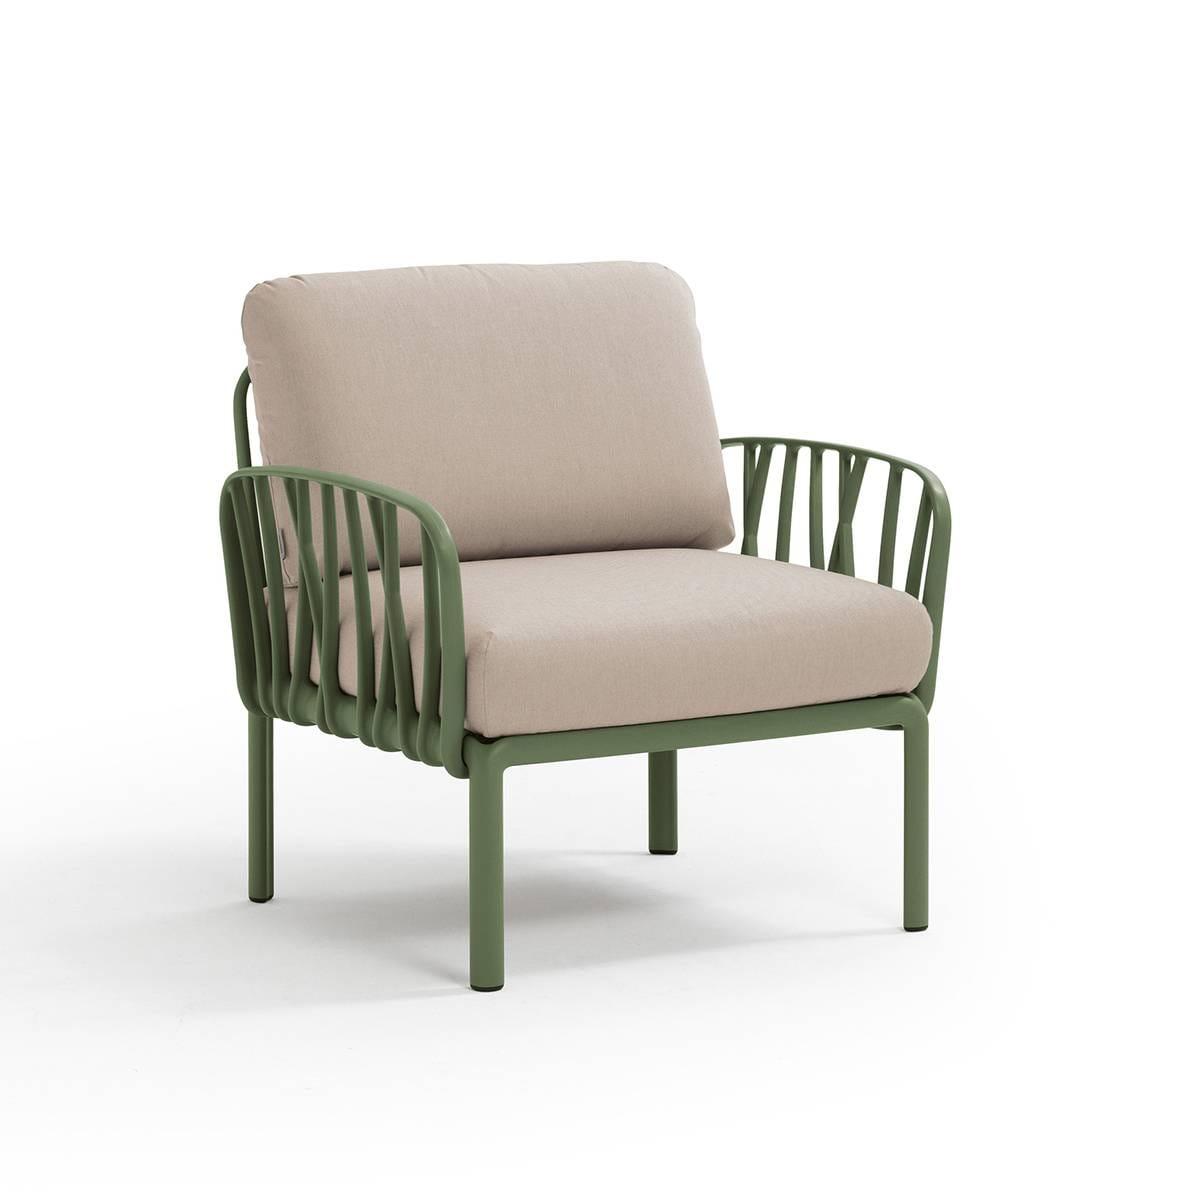 Nardi Sofa Komodo Poltrona Agave-Canvas